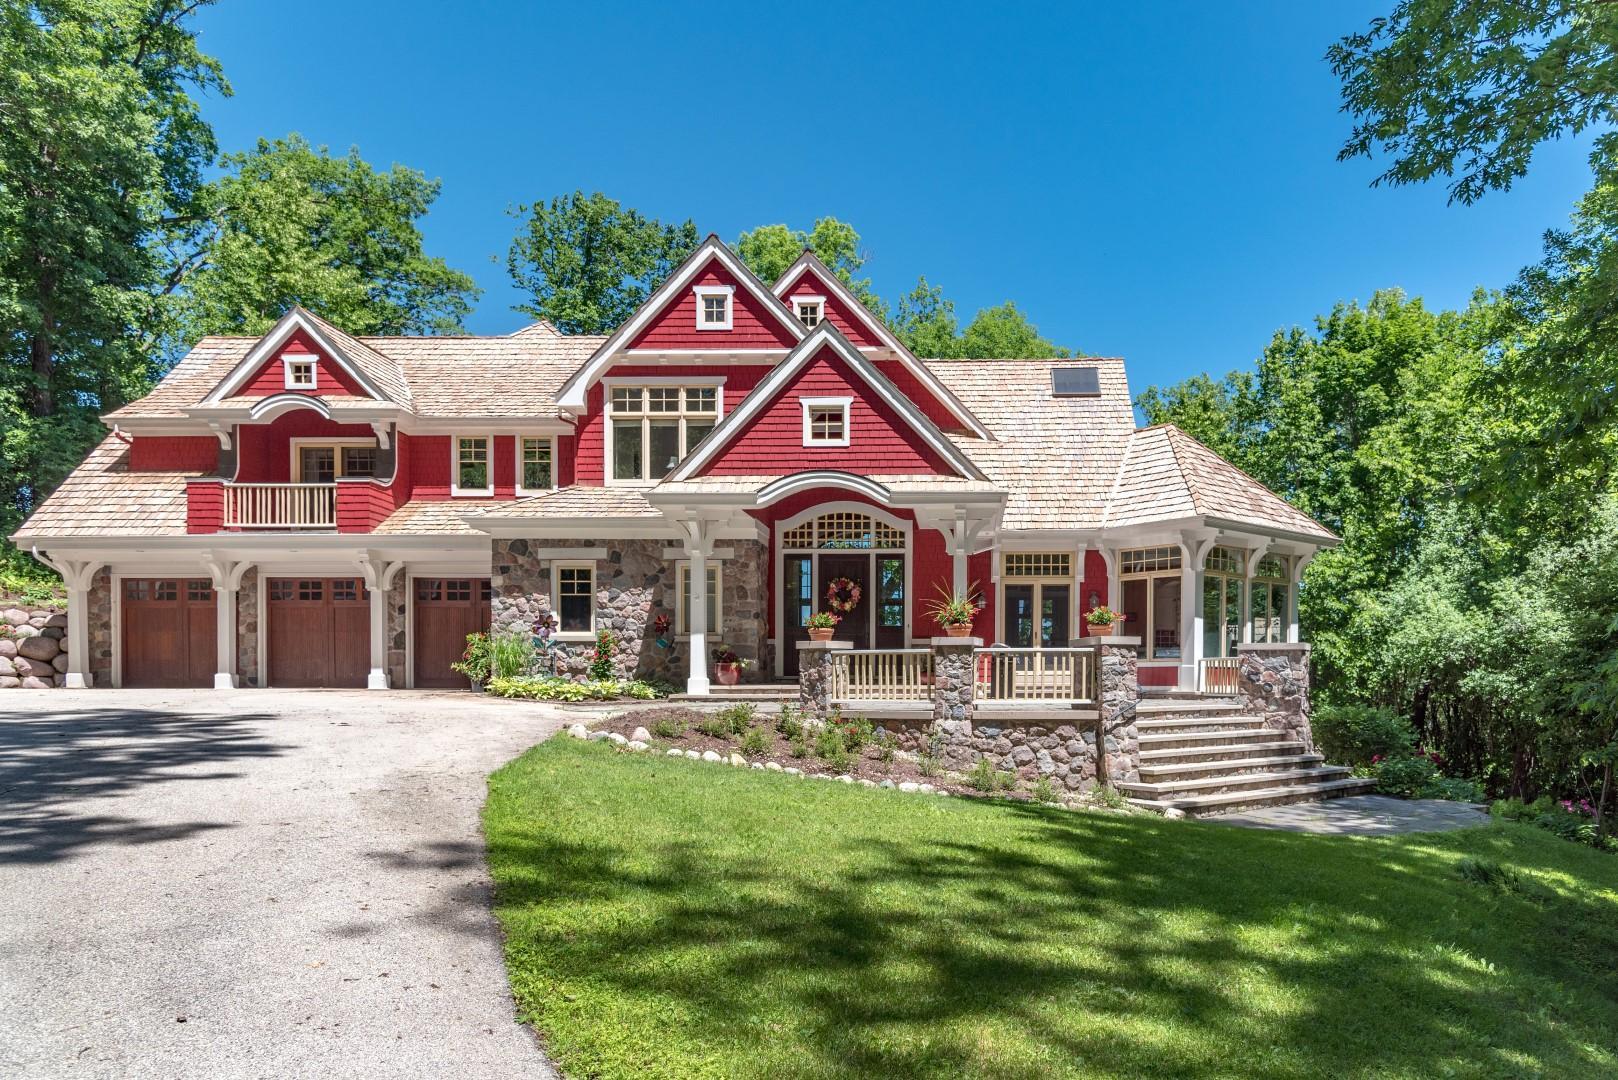 31150 Thompson Ln, Chenequa, Wisconsin 53029, 5 Bedrooms Bedrooms, 13 Rooms Rooms,3 BathroomsBathrooms,Single-Family,For Sale,Thompson Ln,1569228